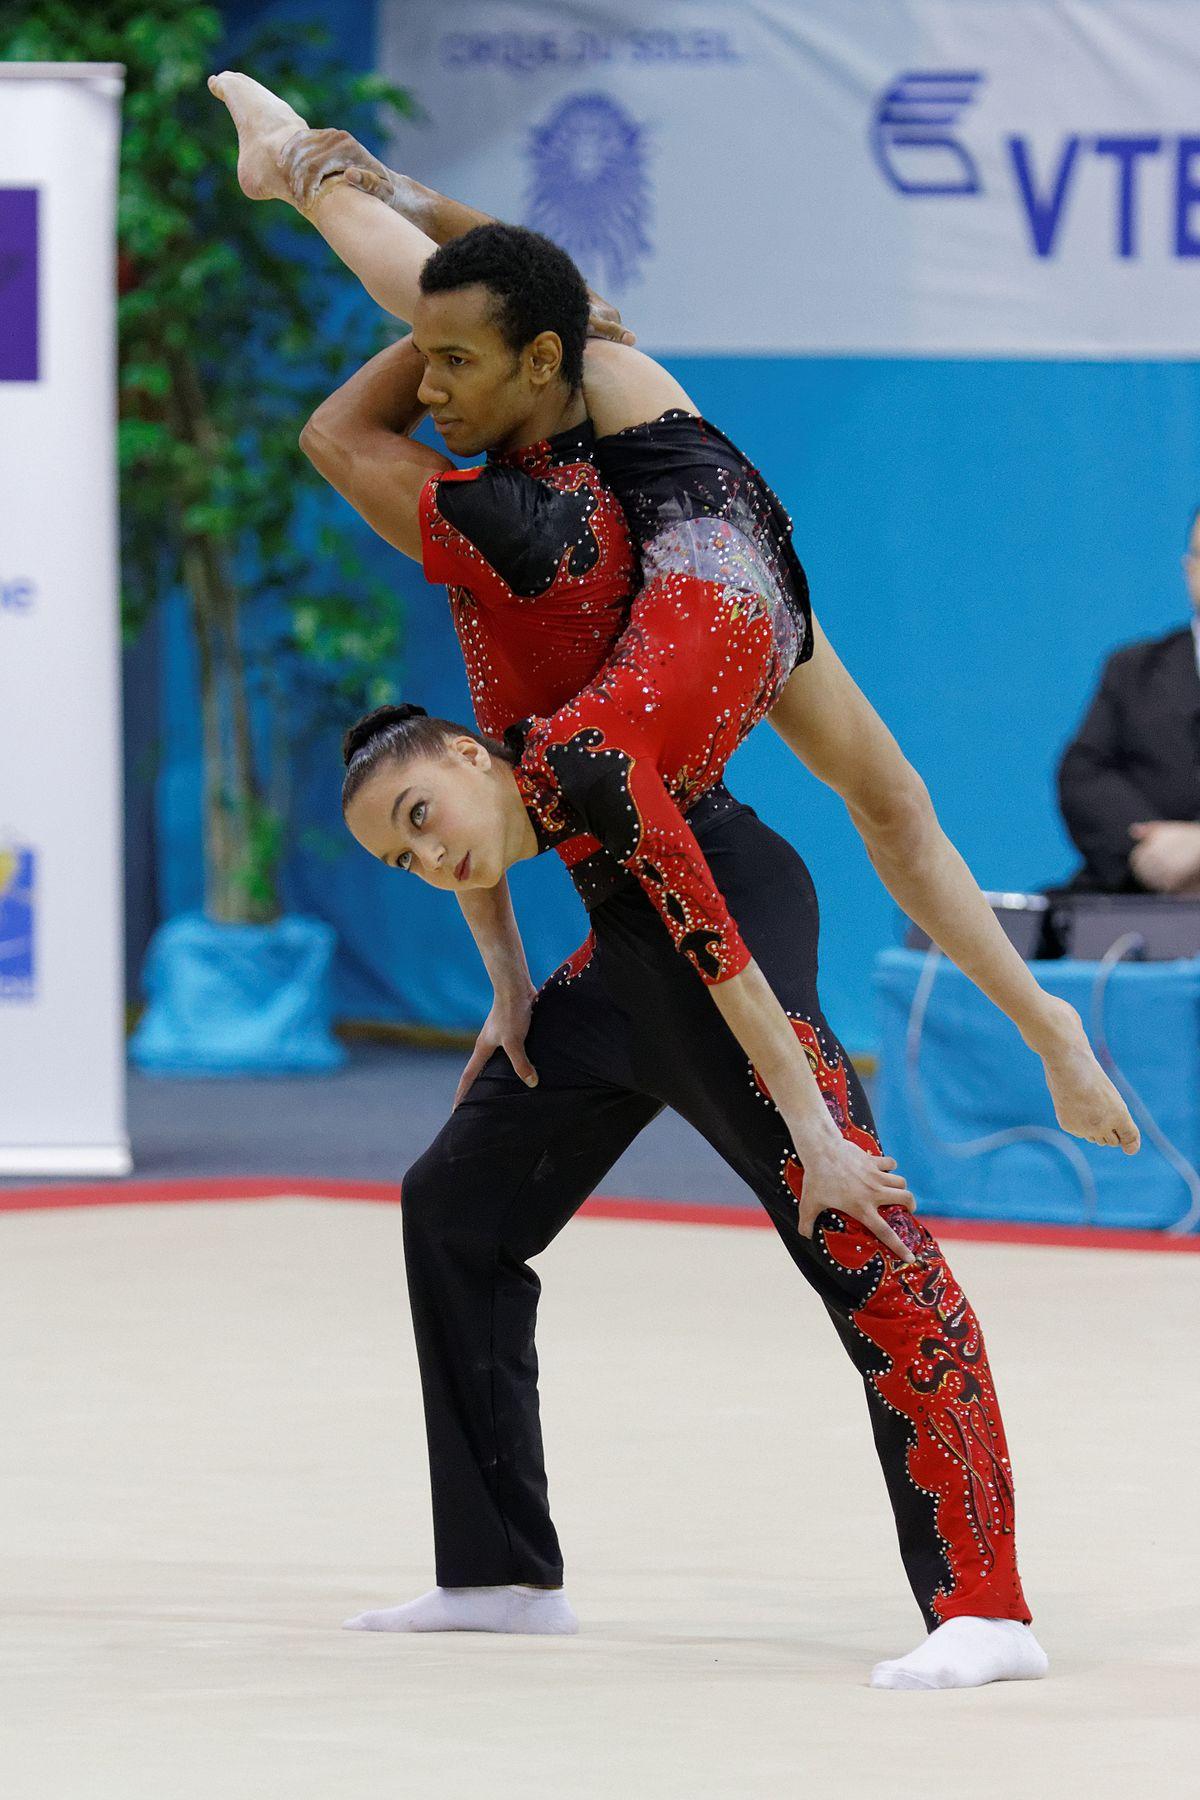 Mariana Gradim Alves Amorim - Wikipedia Acrobatic Gymnastics Mixed Pair